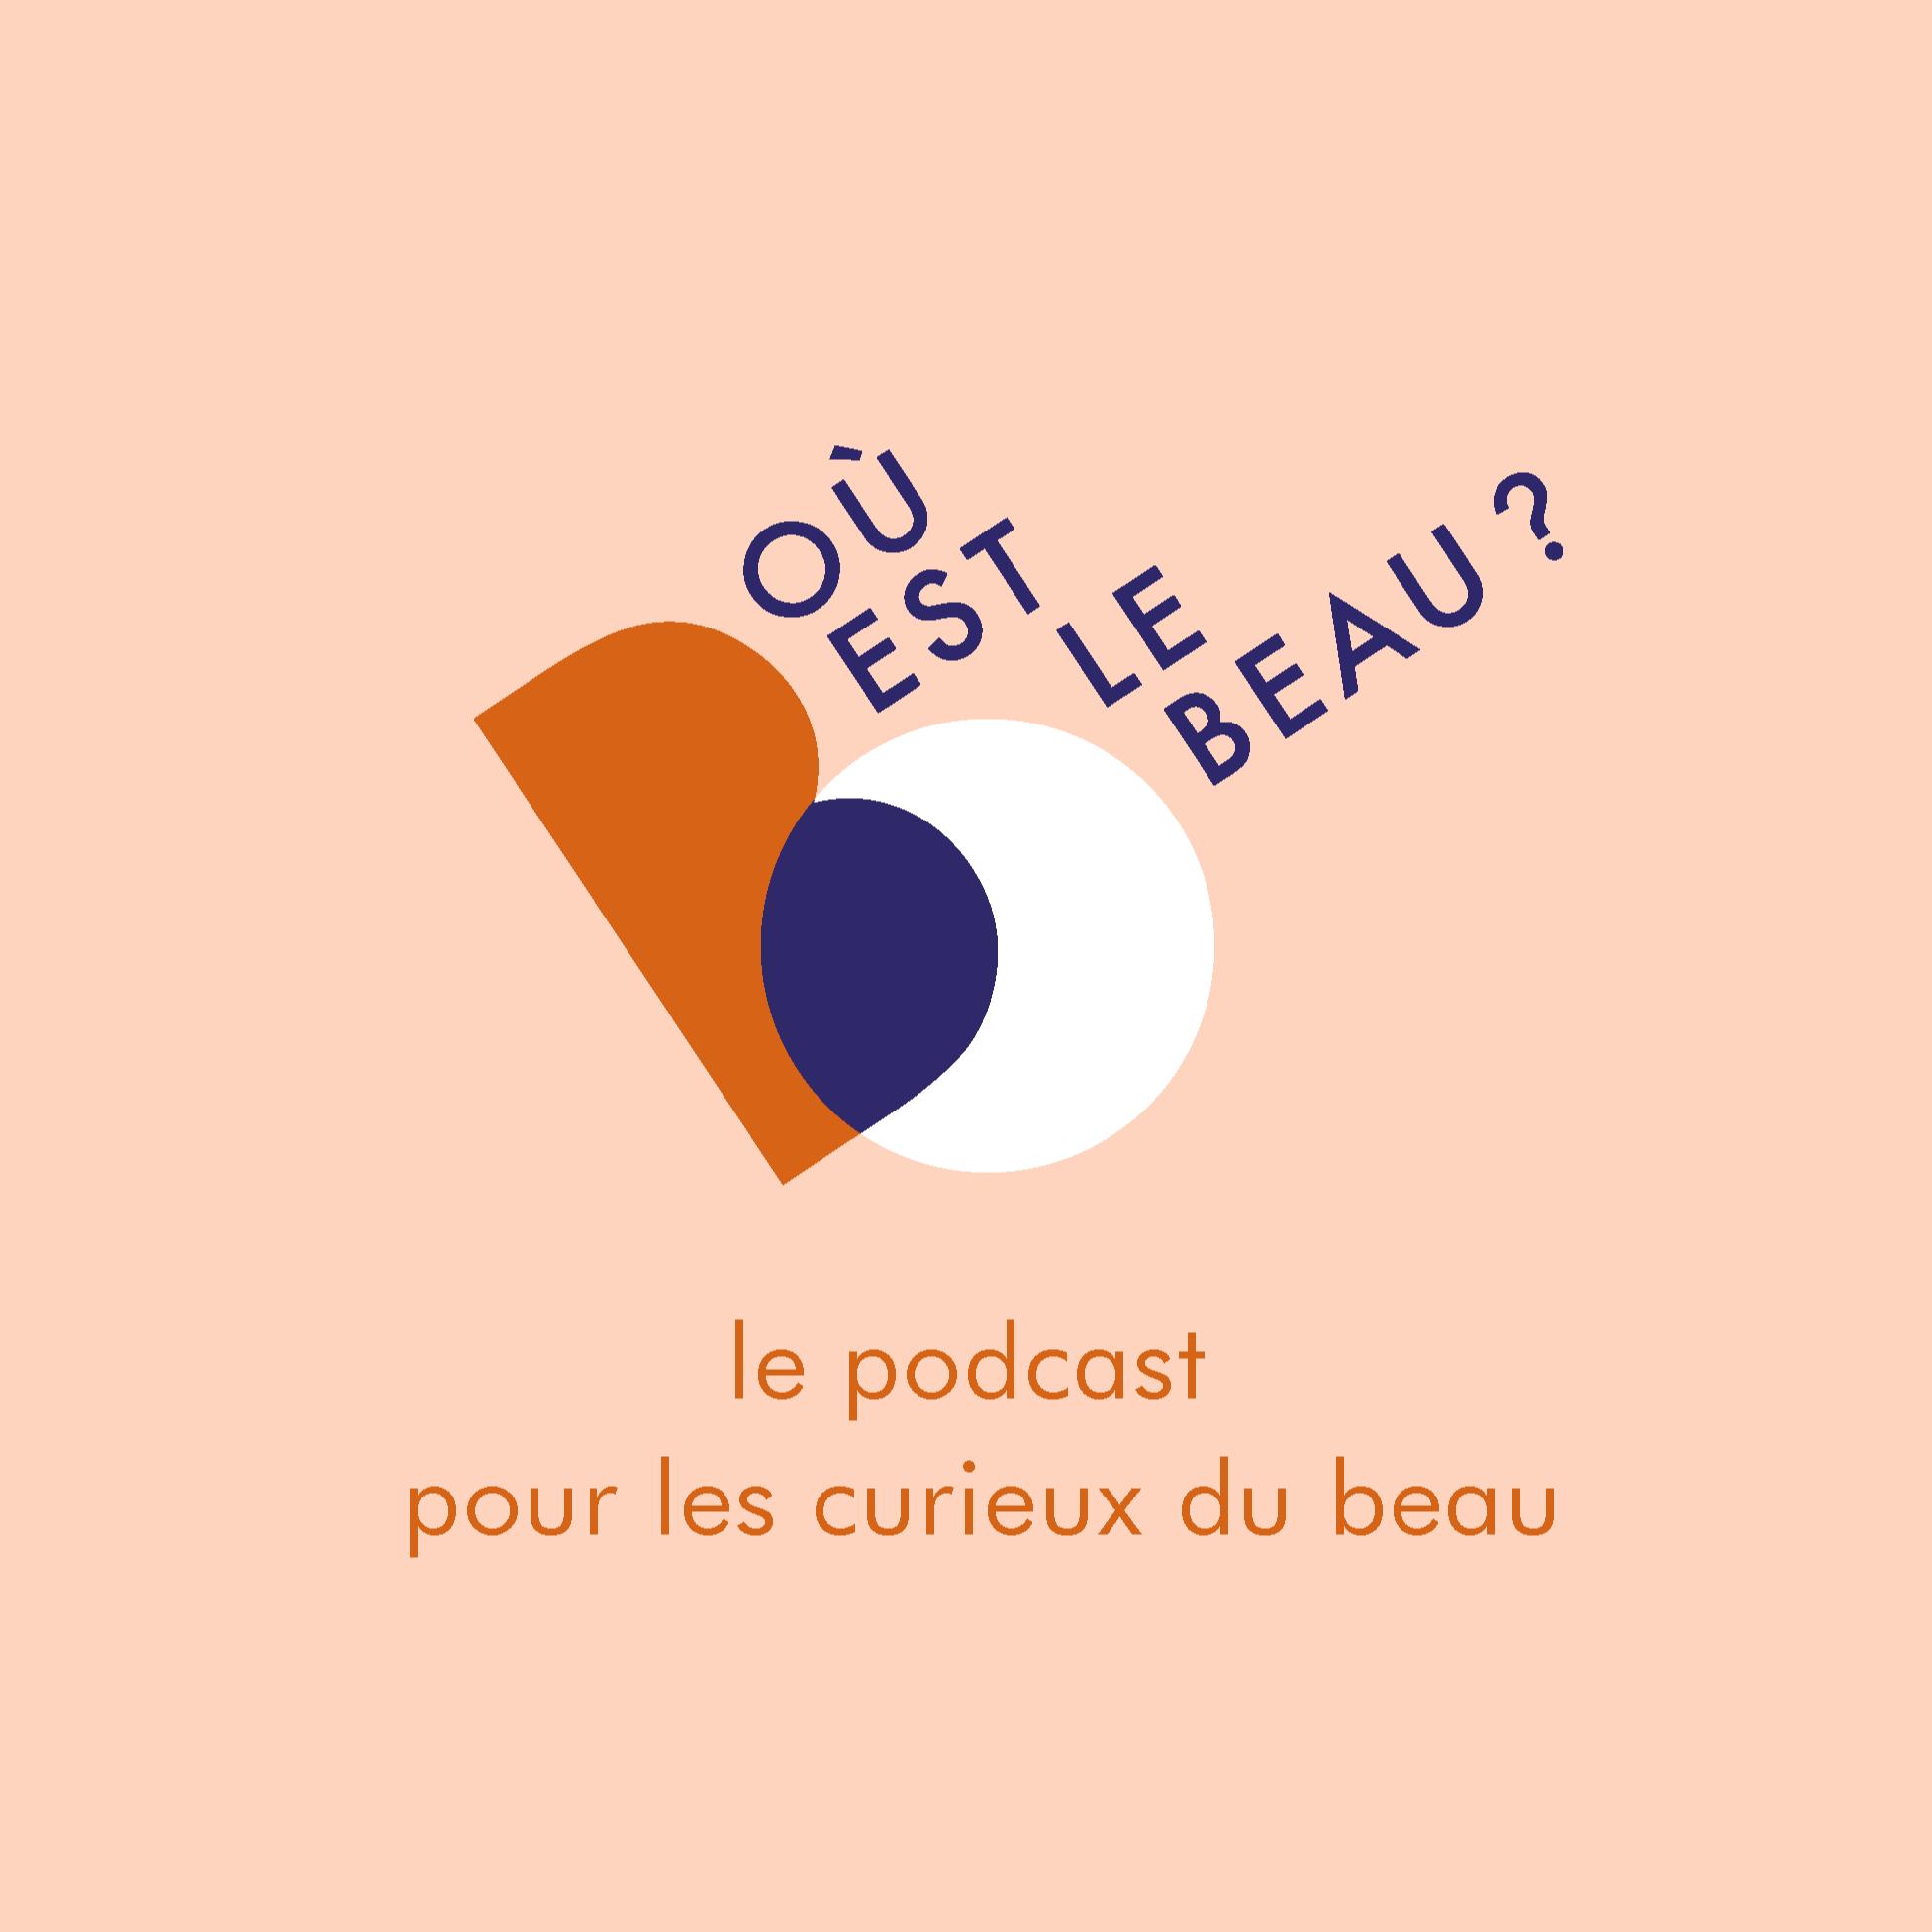 @ouestlebeau Profile Image | Linktree